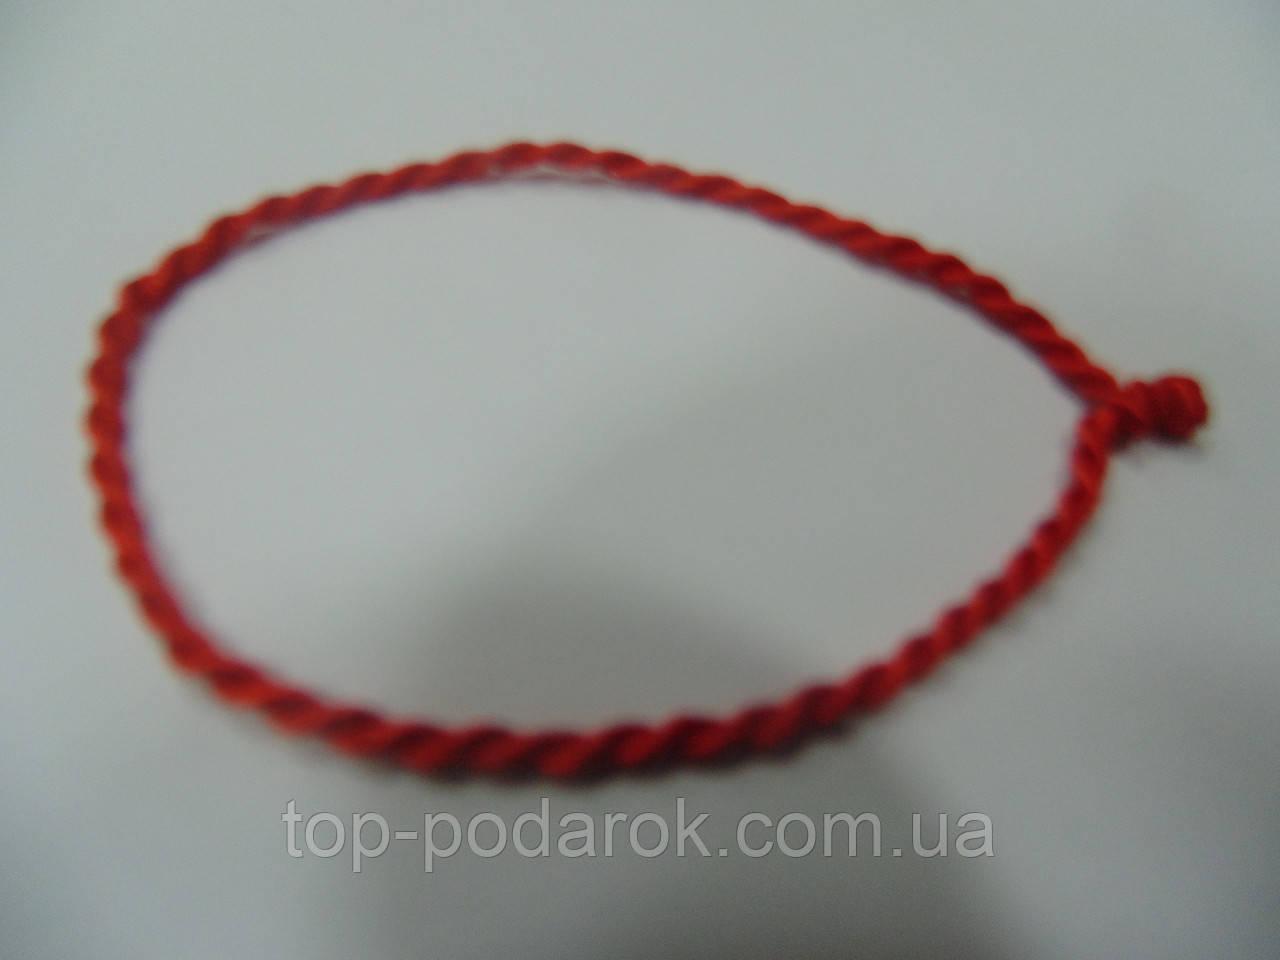 Оберег из красной нити на руку